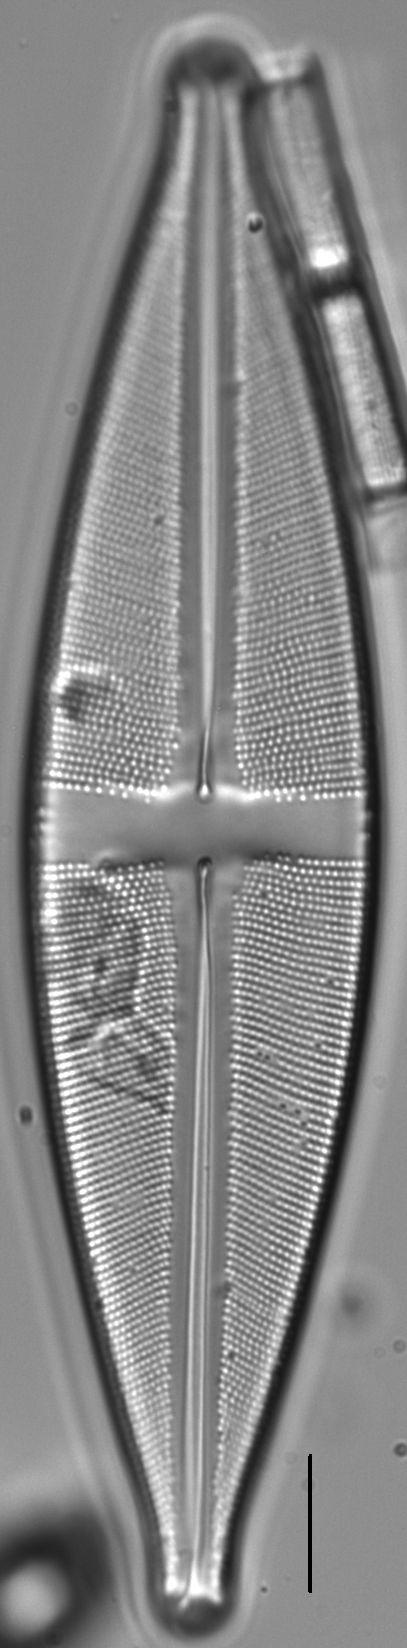 Stauroneis sonyae LM1